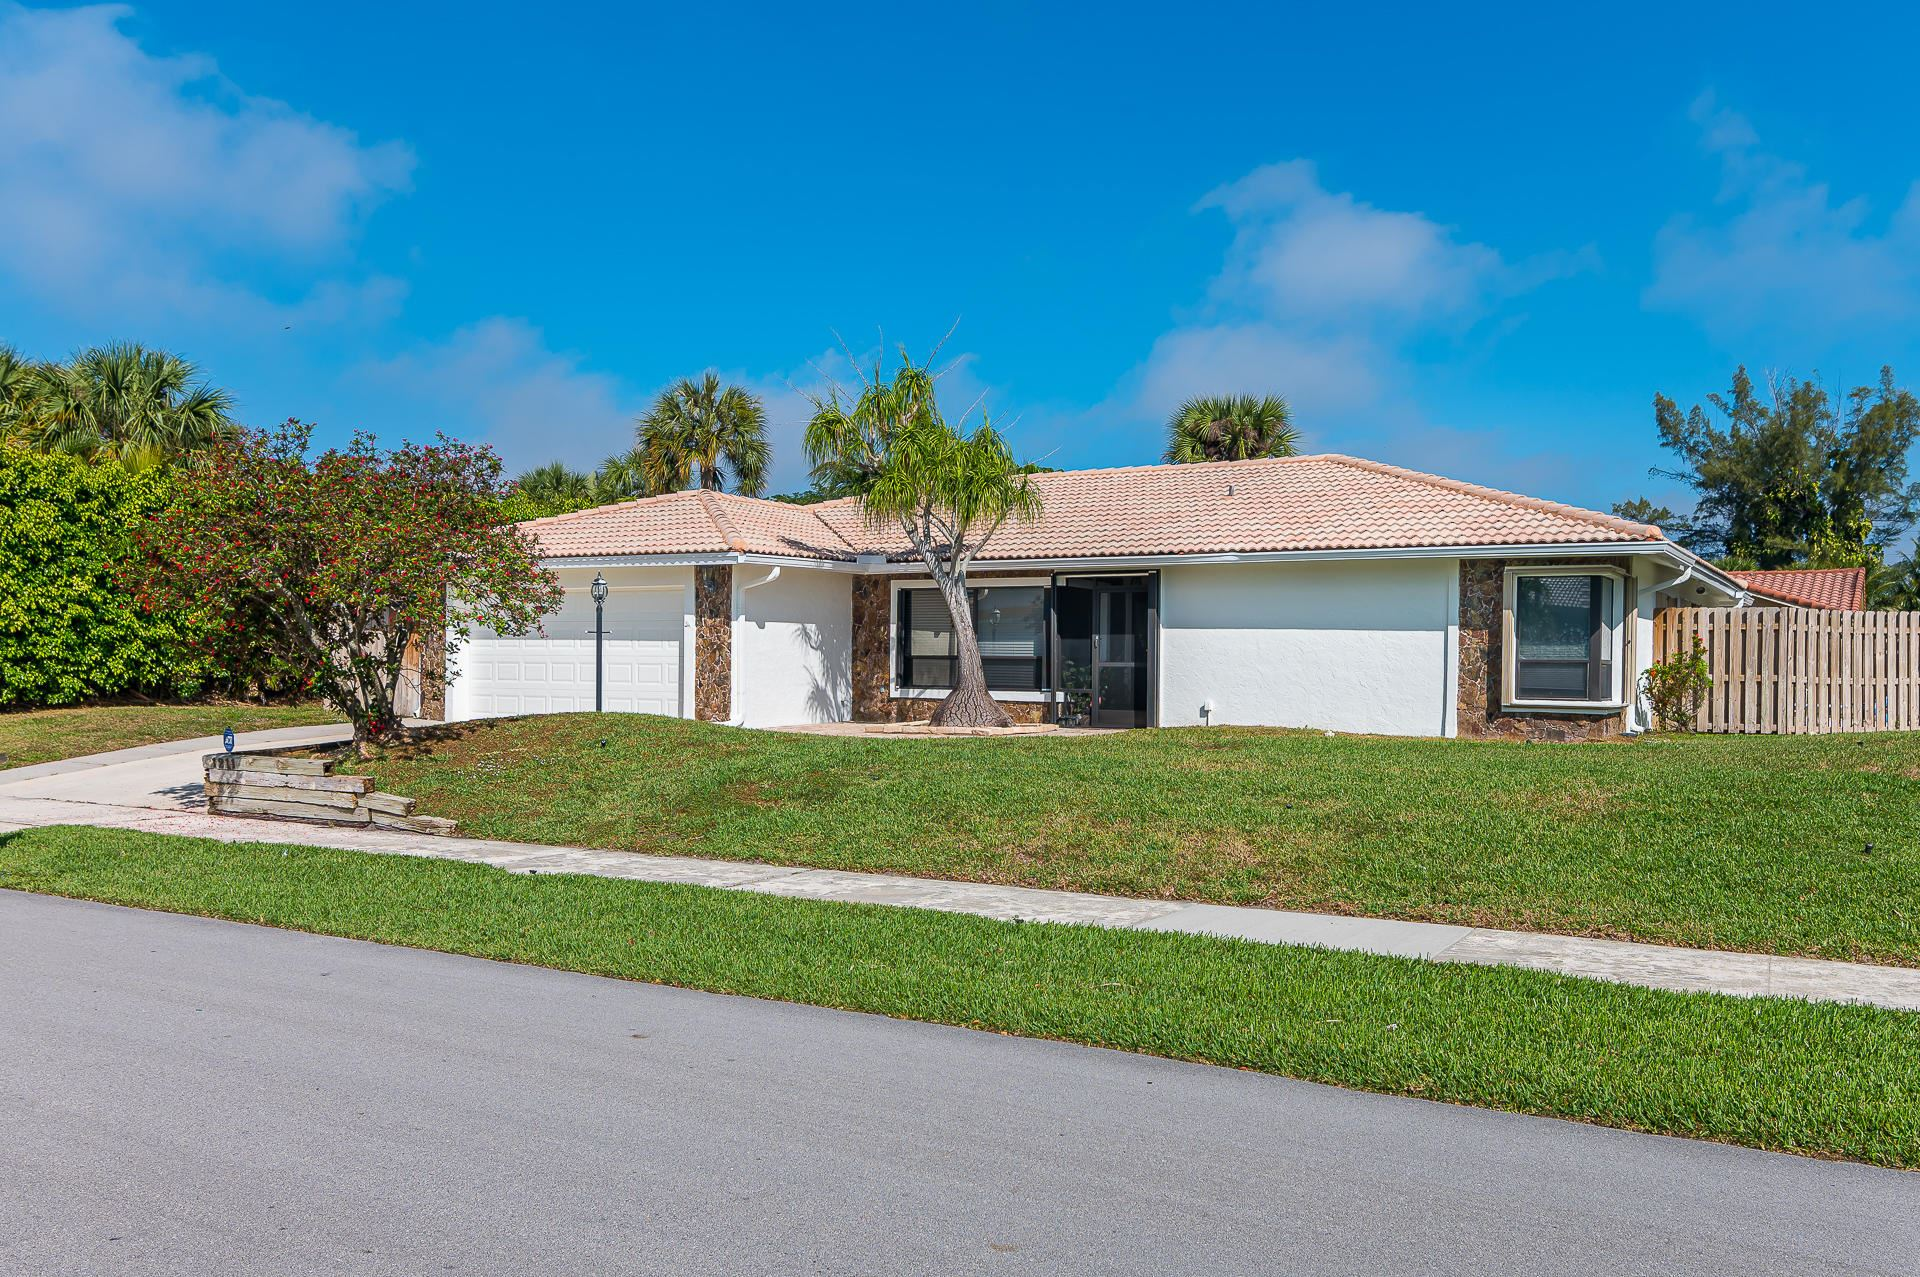 Photo of 1211 NW 15th Street, Boca Raton, FL 33486 (MLS # RX-10696143)